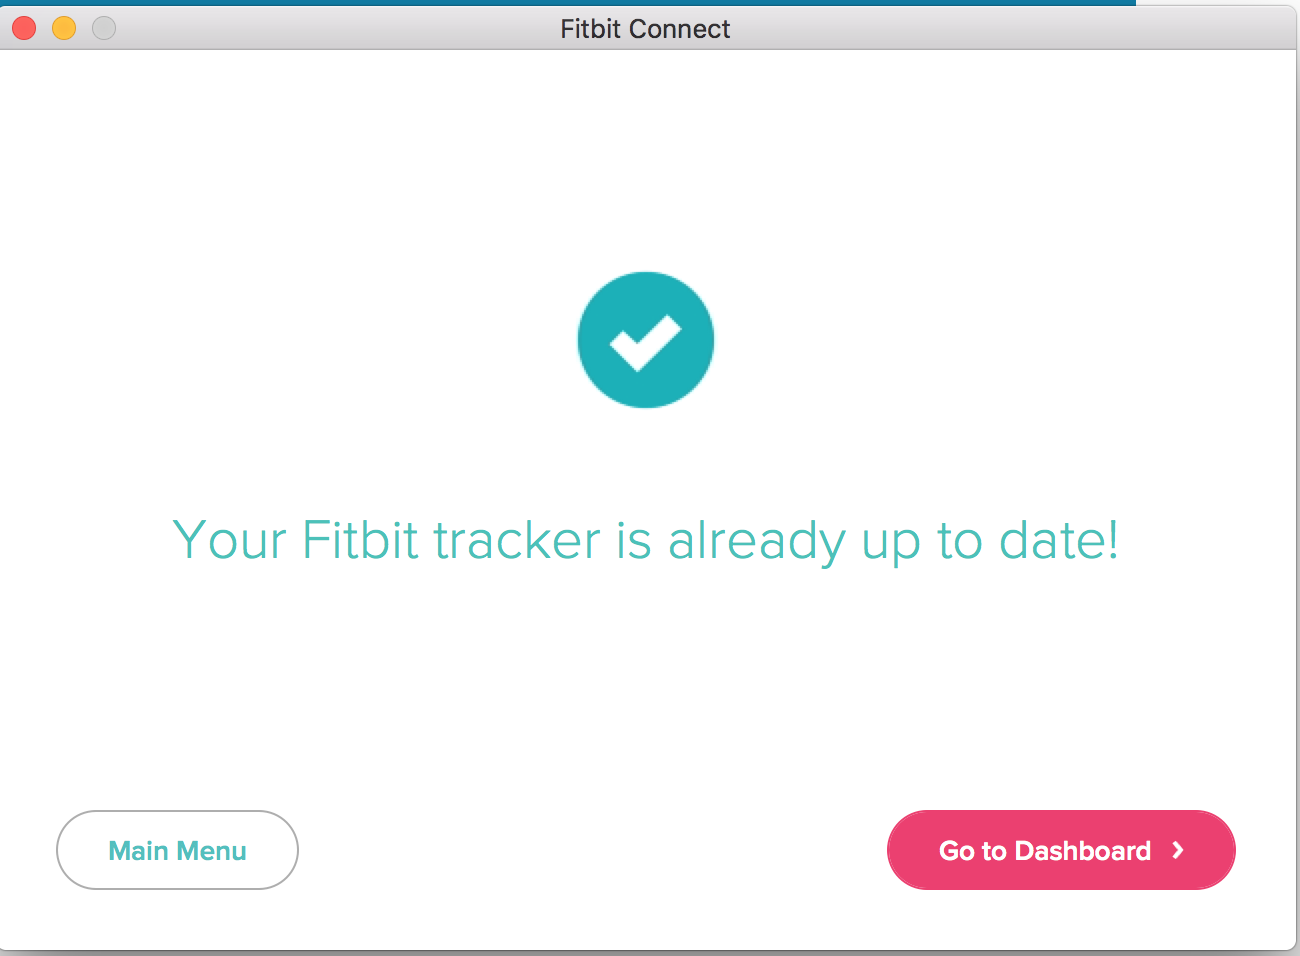 latest ionic firmware version site community.fitbit.com